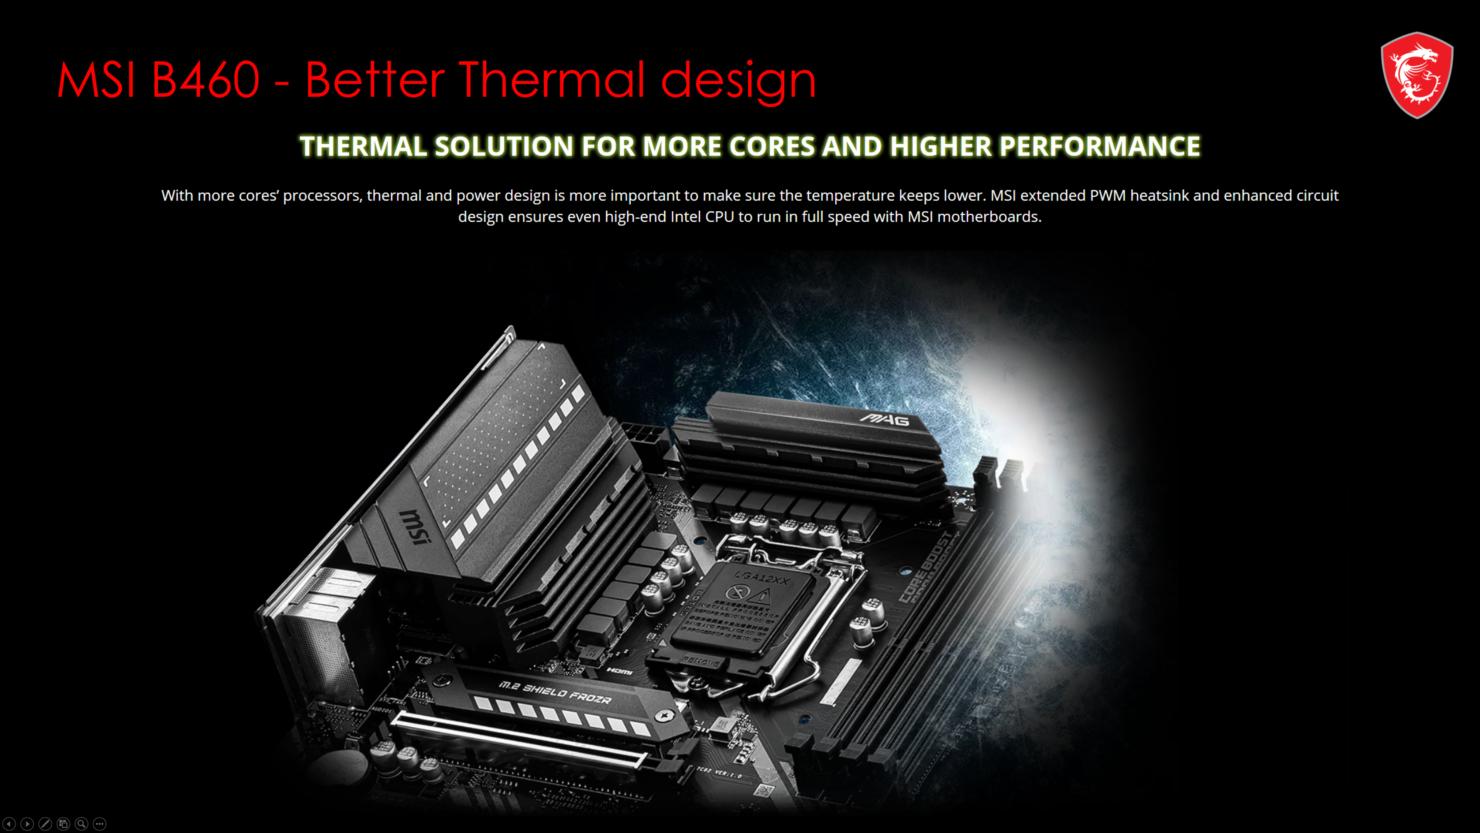 Intel Non-K CPU Overclock on MSI, ASUS, ASRock H470, B460, H410 Motherboards_4